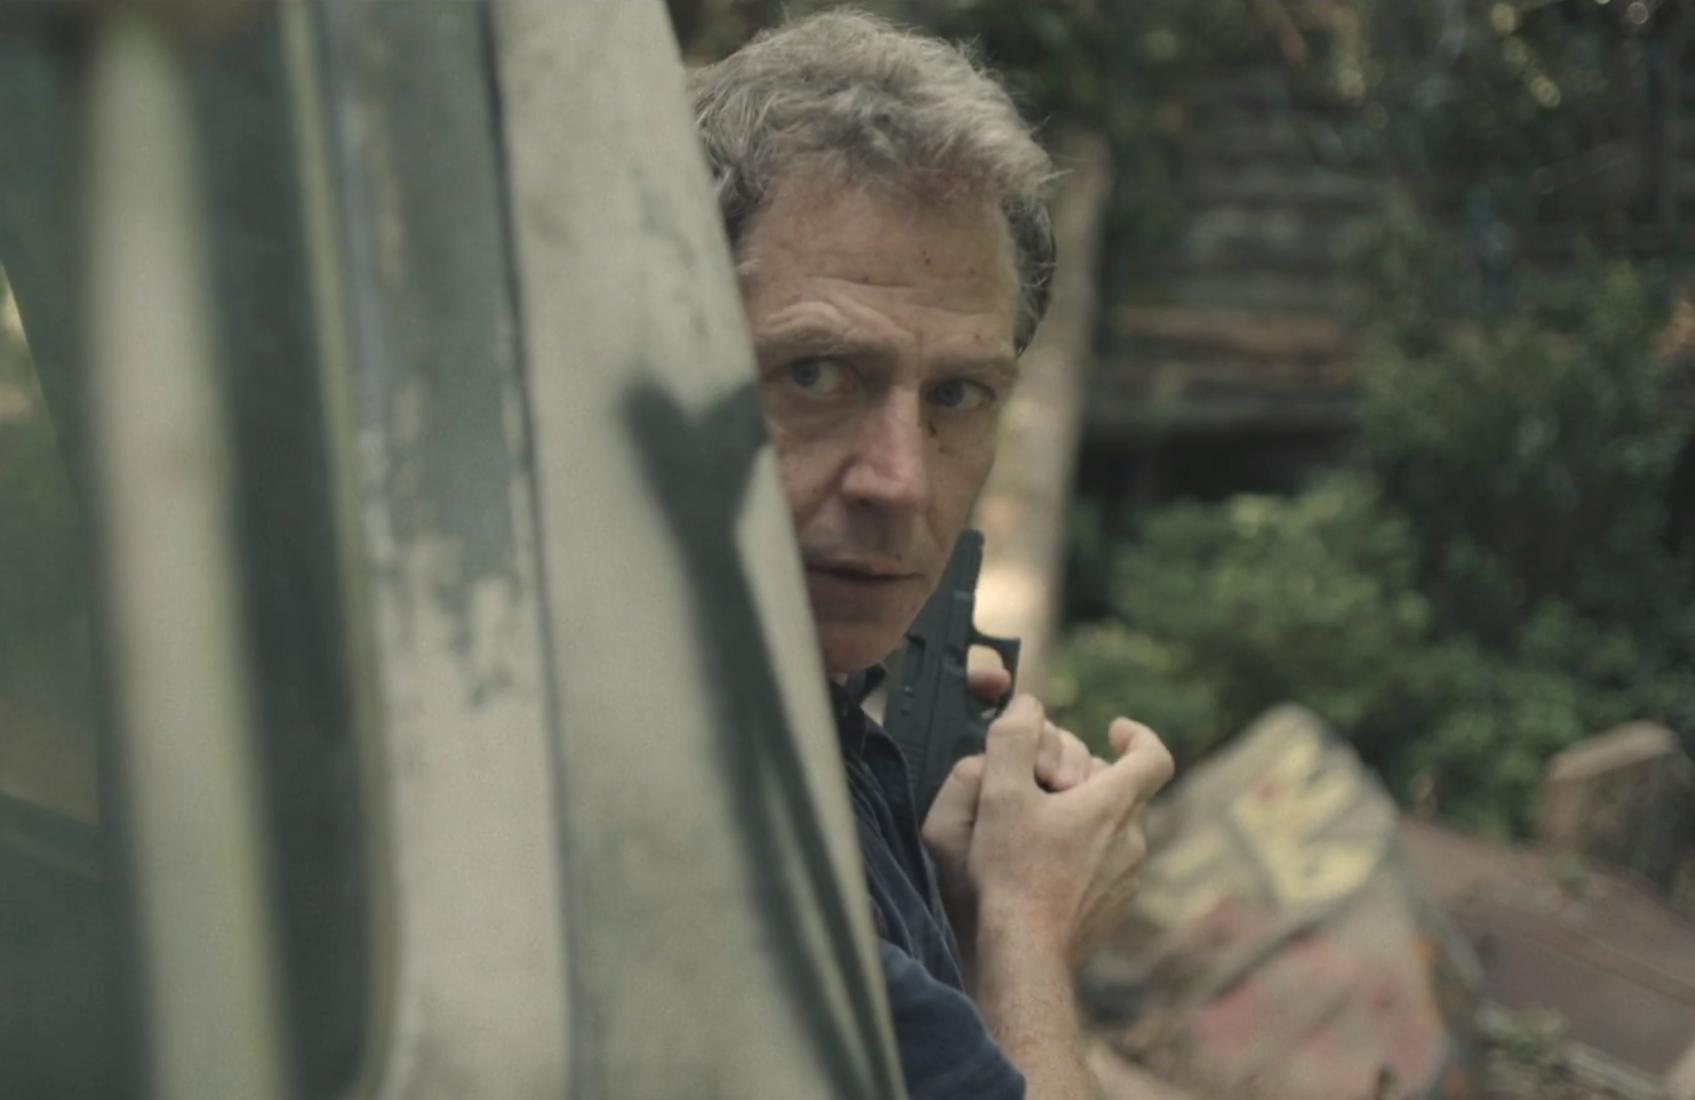 Ben Mendelsohn in a scene from Sunday's season finale of The Outsider. (HBO)